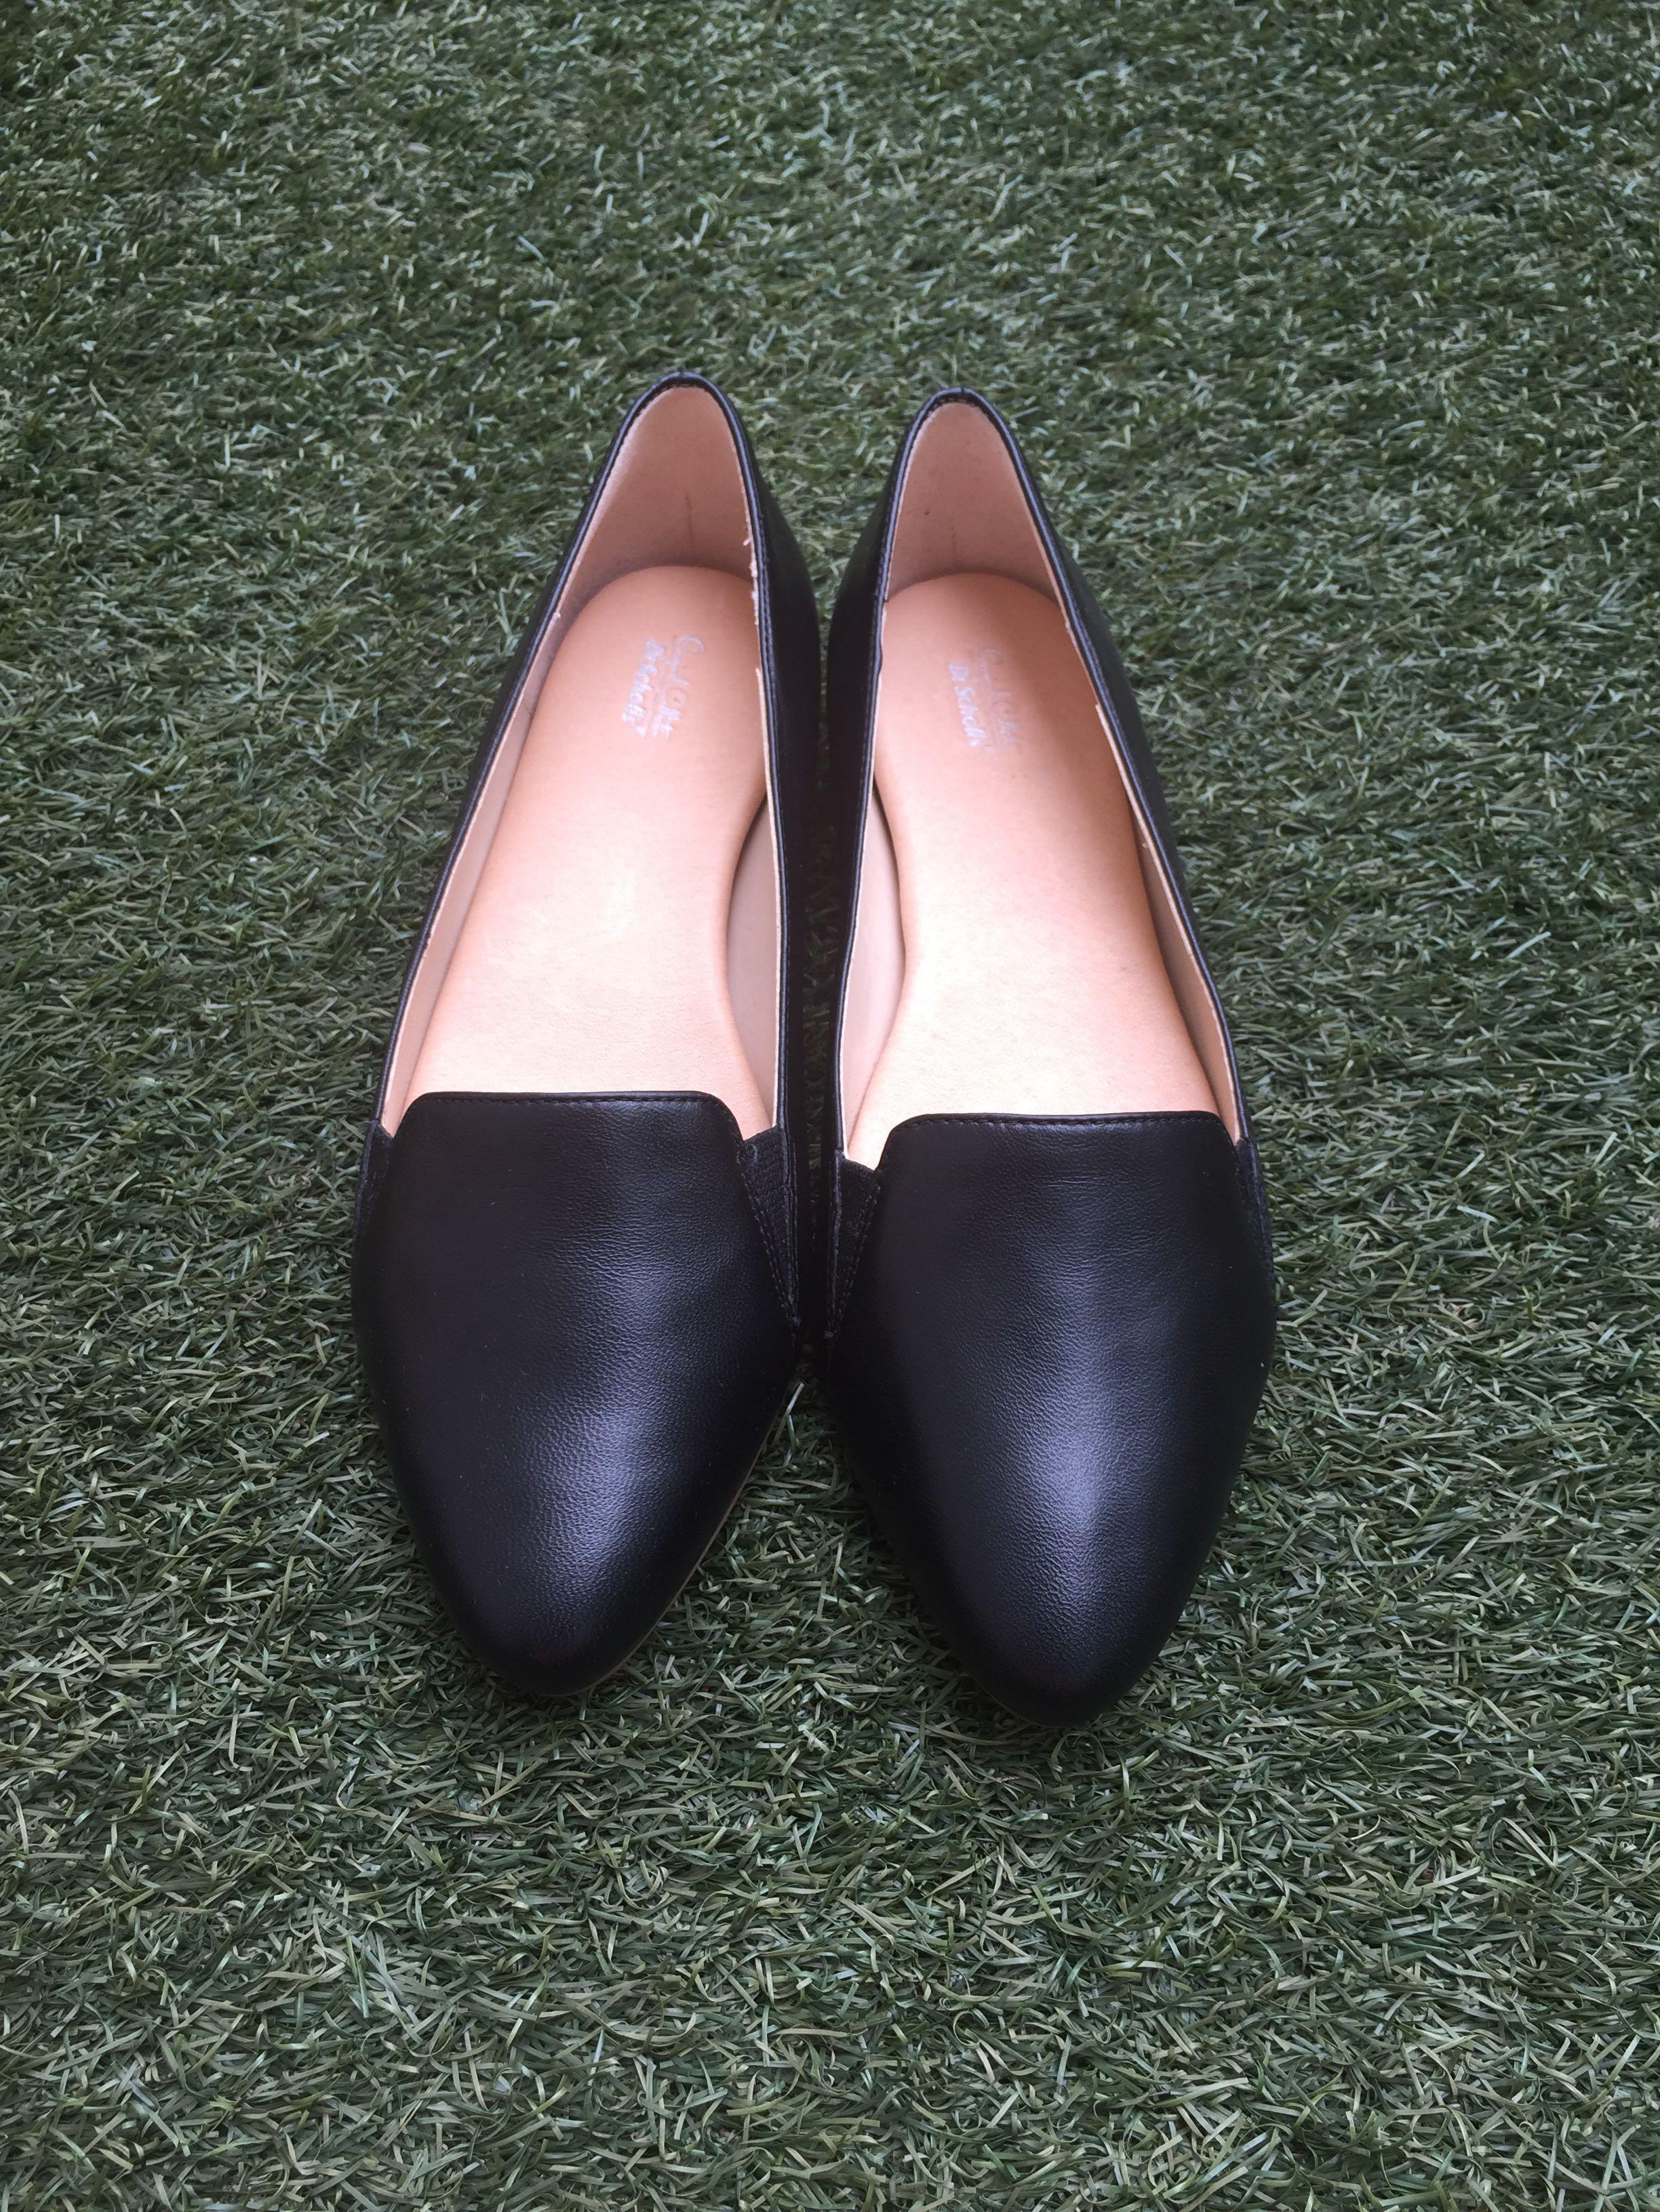 538f7af5d5 Dr Scholl's Flats/Loafers (Black), Women's Fashion, Shoes, Flats ...